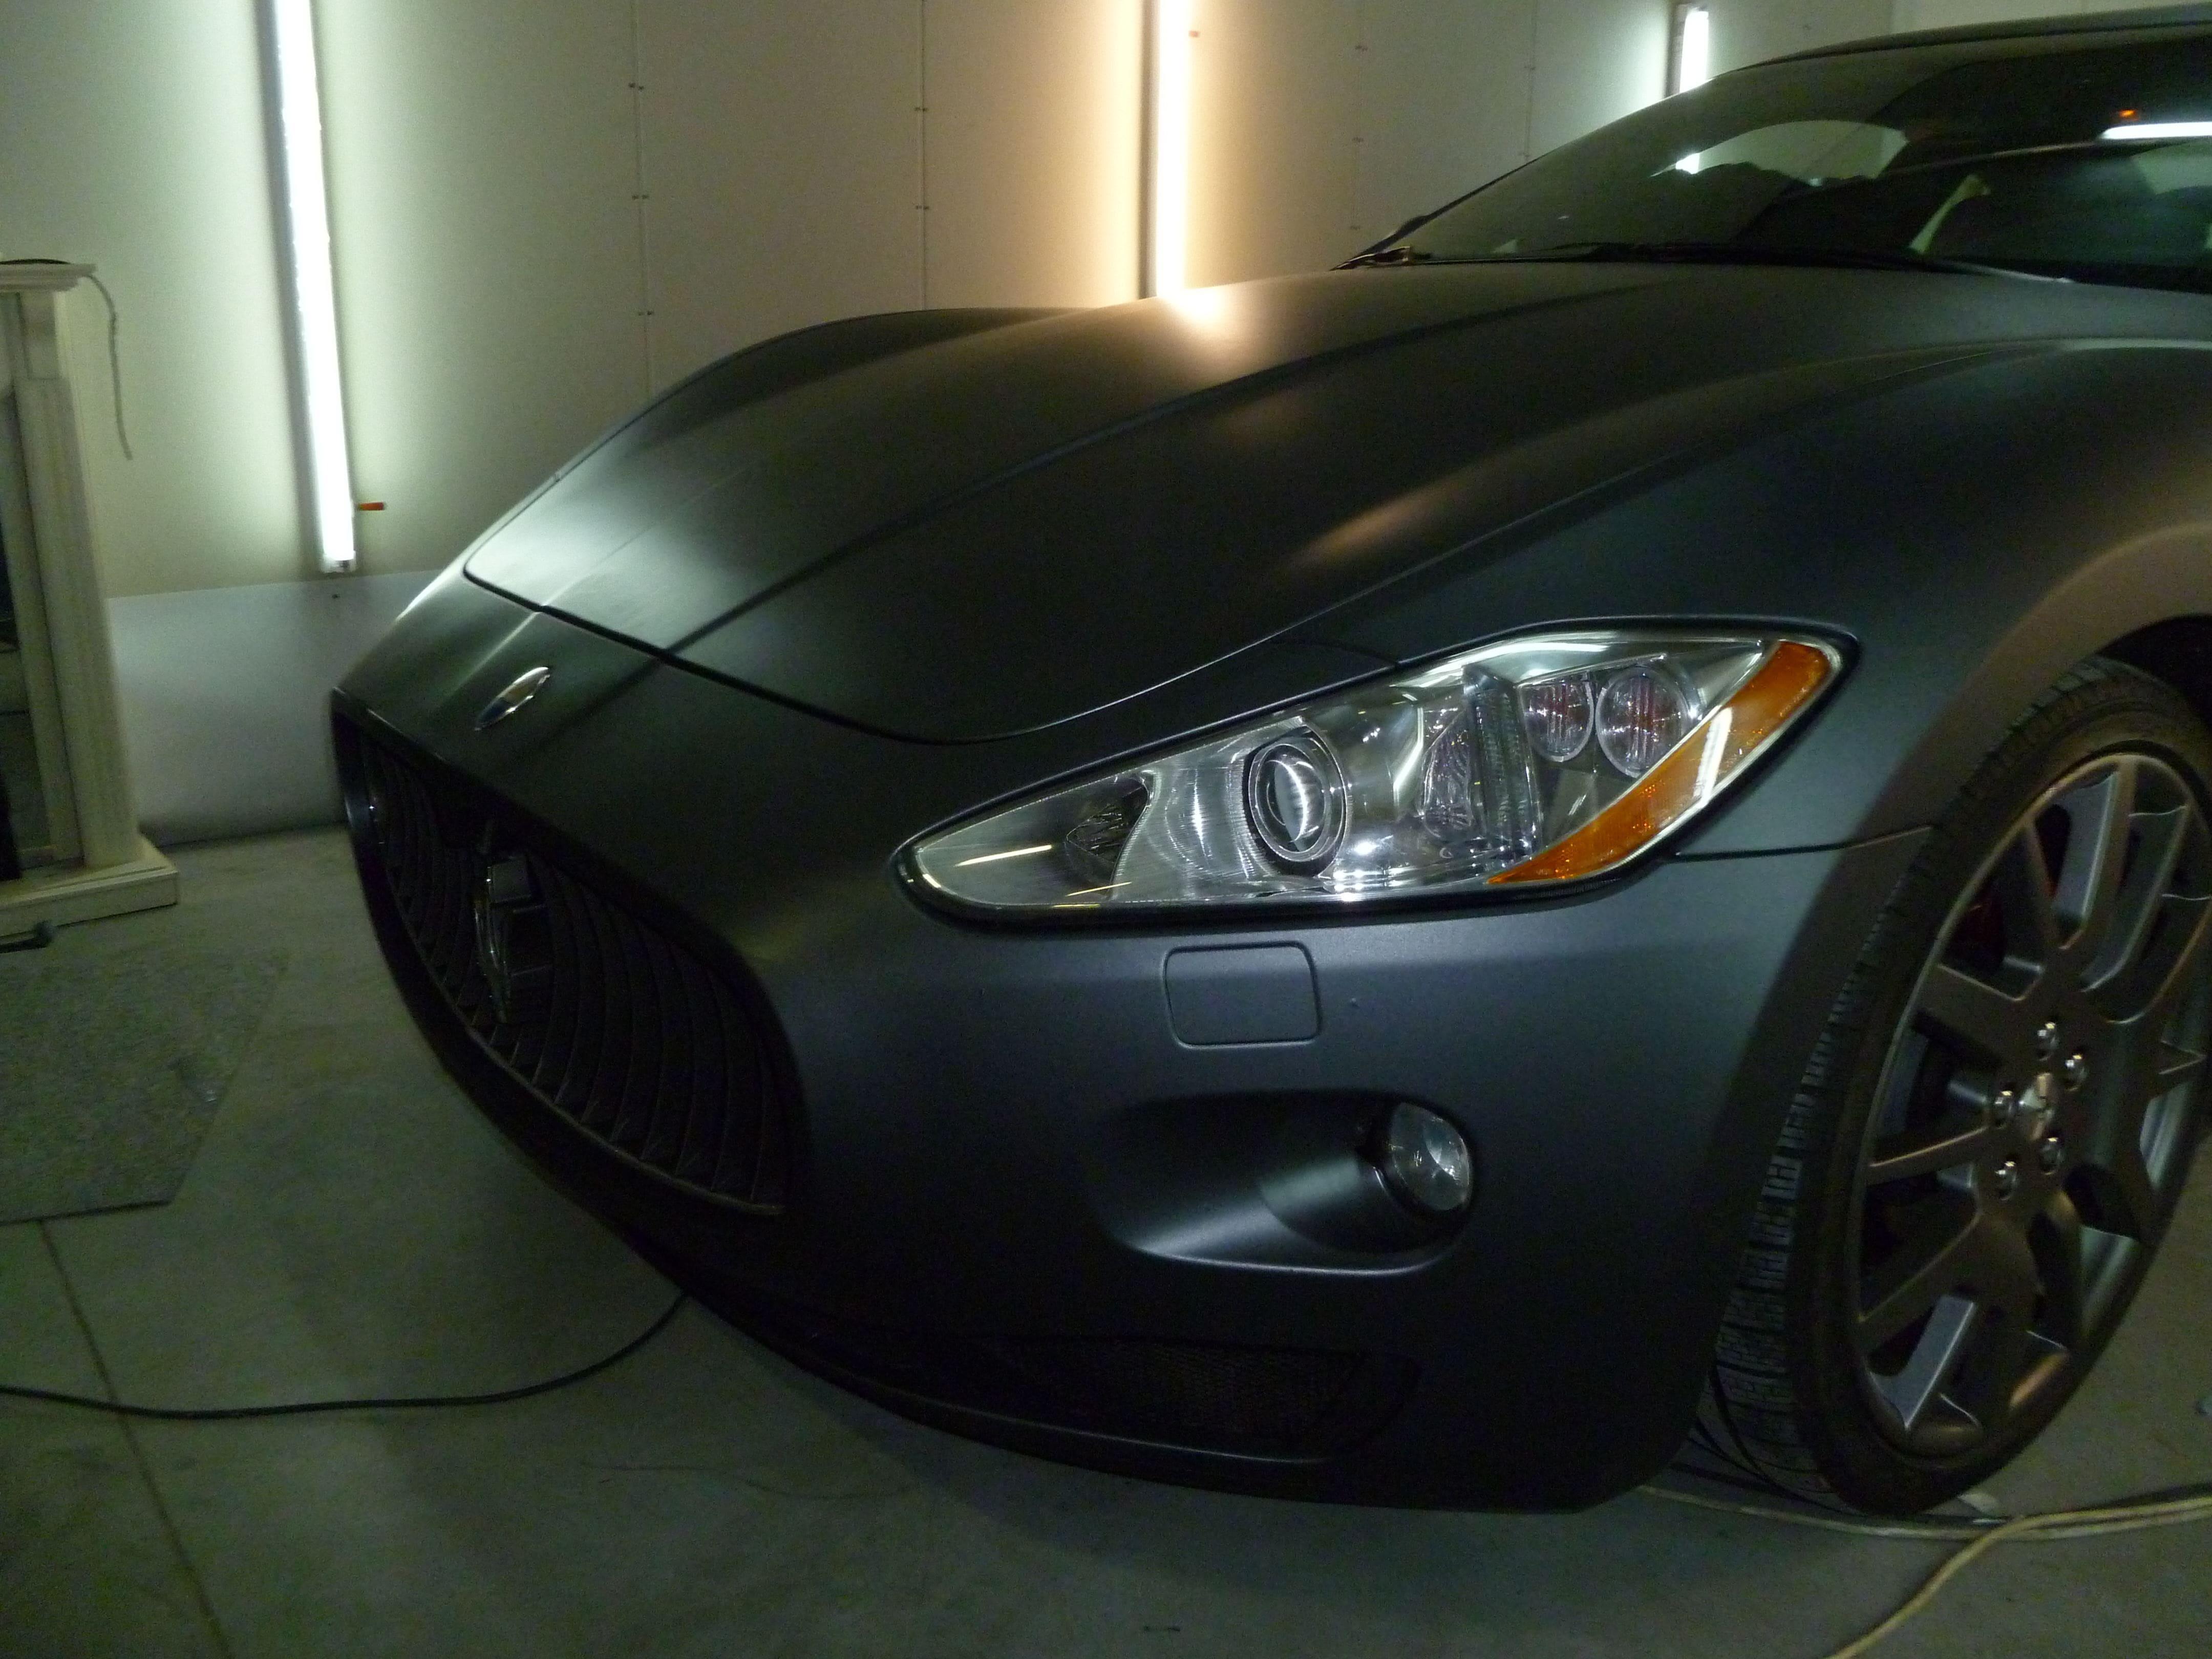 Maserati Gran Turismo met Mat Zwarte Wrap, Carwrapping door Wrapmyride.nu Foto-nr:6058, ©2020